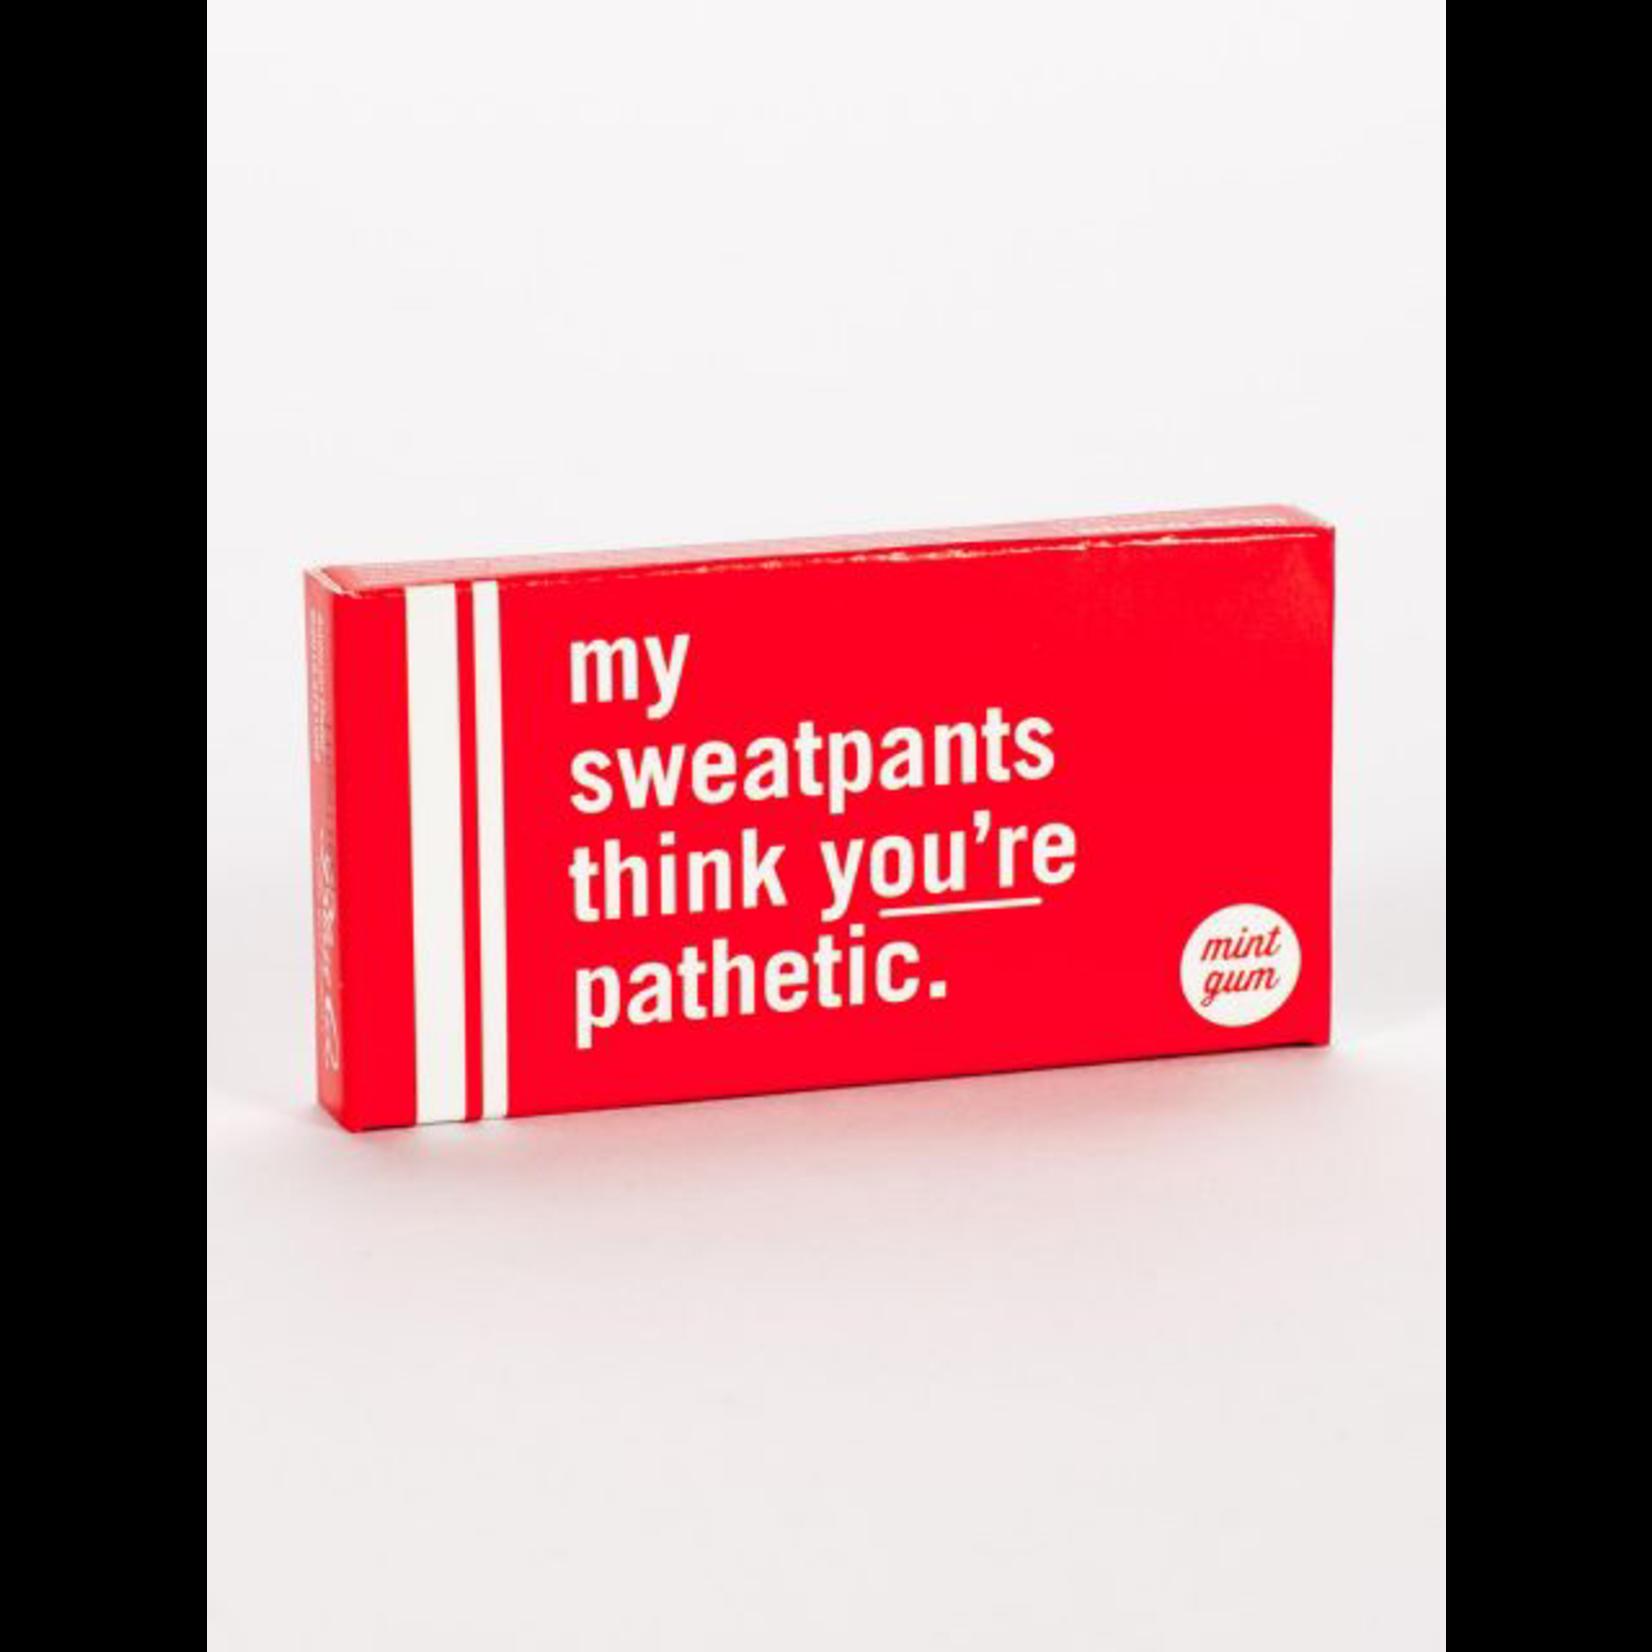 Gum - My Sweatpants Think Youre Pathetic